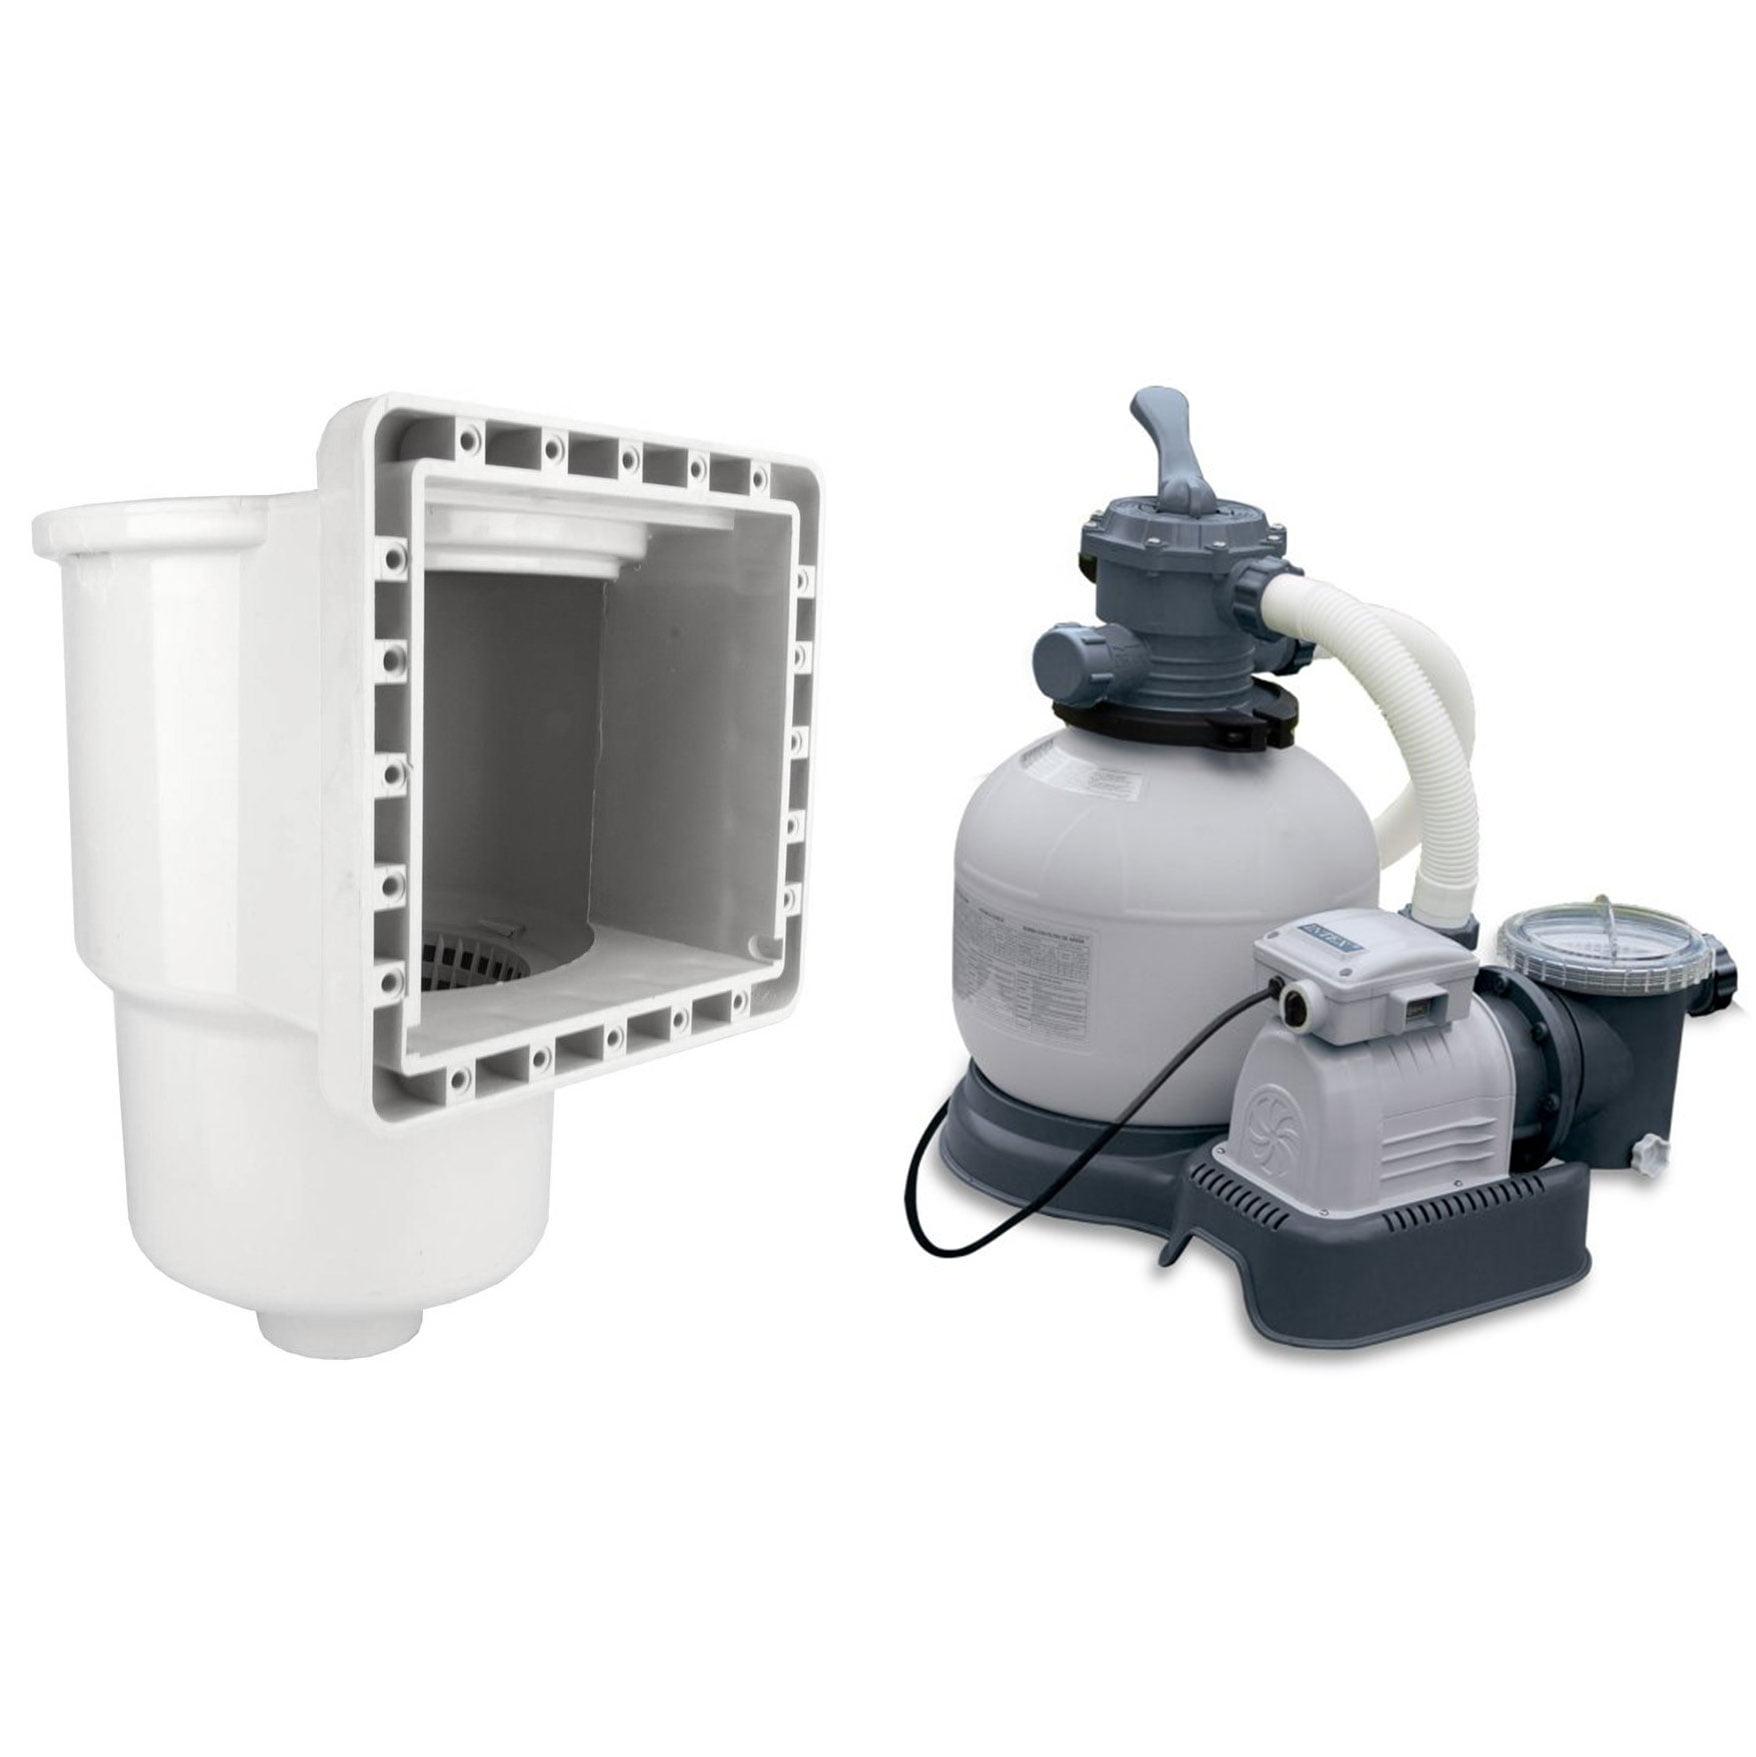 Hydro Tools Above Ground Pool Skimmer & Intex Krystal Clear 2800 GPH Sand Pump